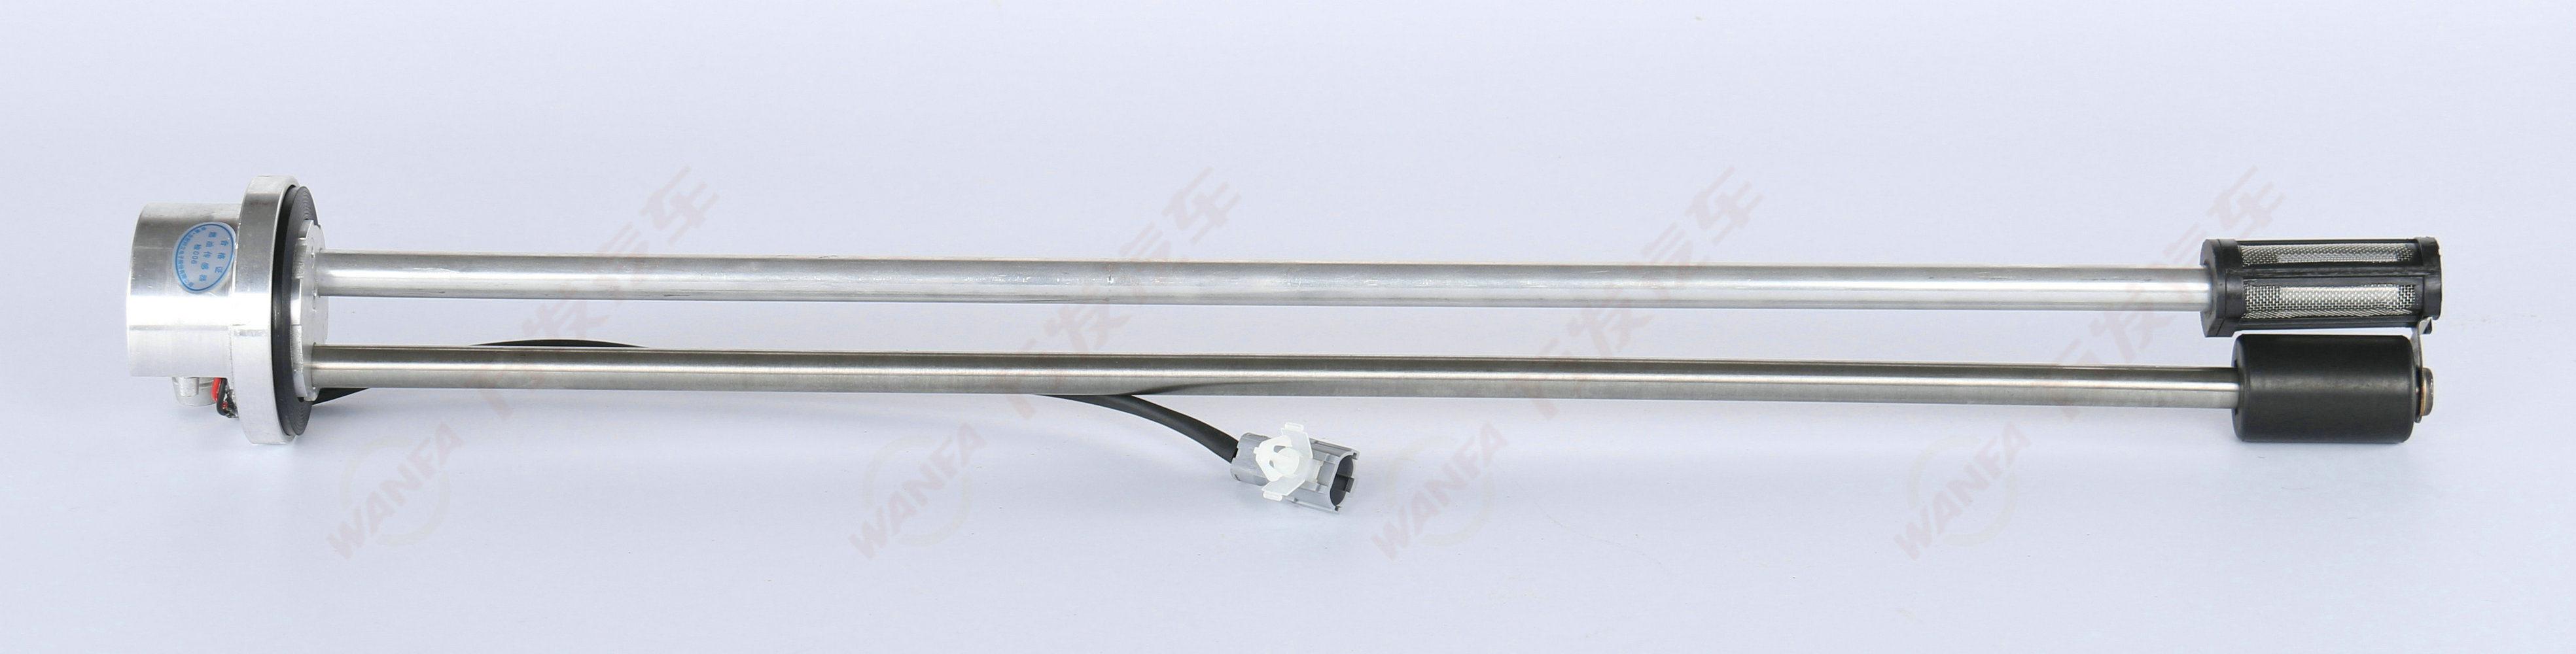 JAC Truck Engine Fuel Sensor 31130-Y3a10xz